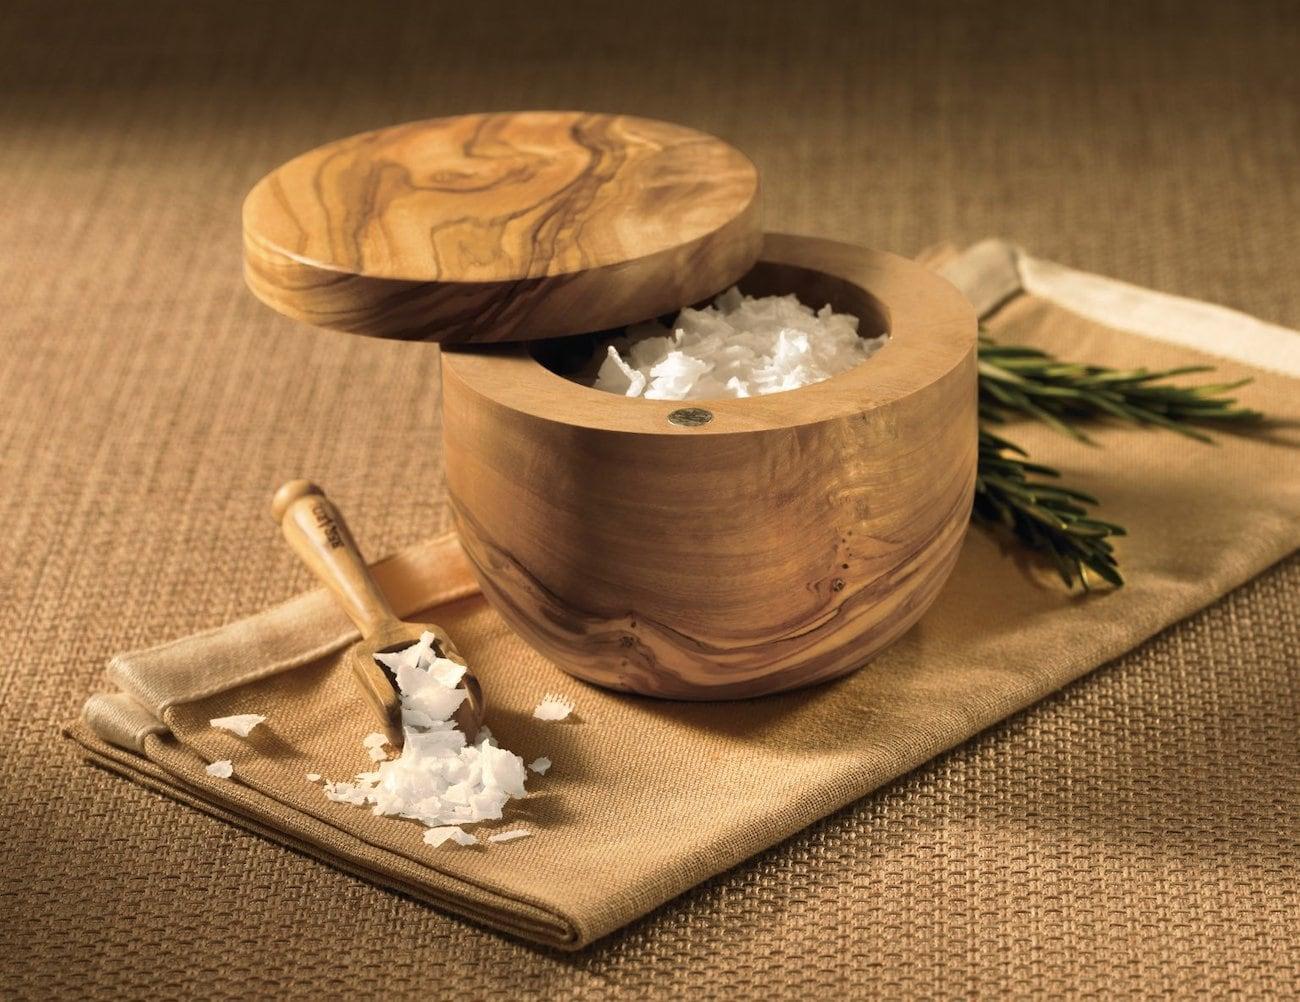 Berard Handcrafted Wooden Salt Keeper